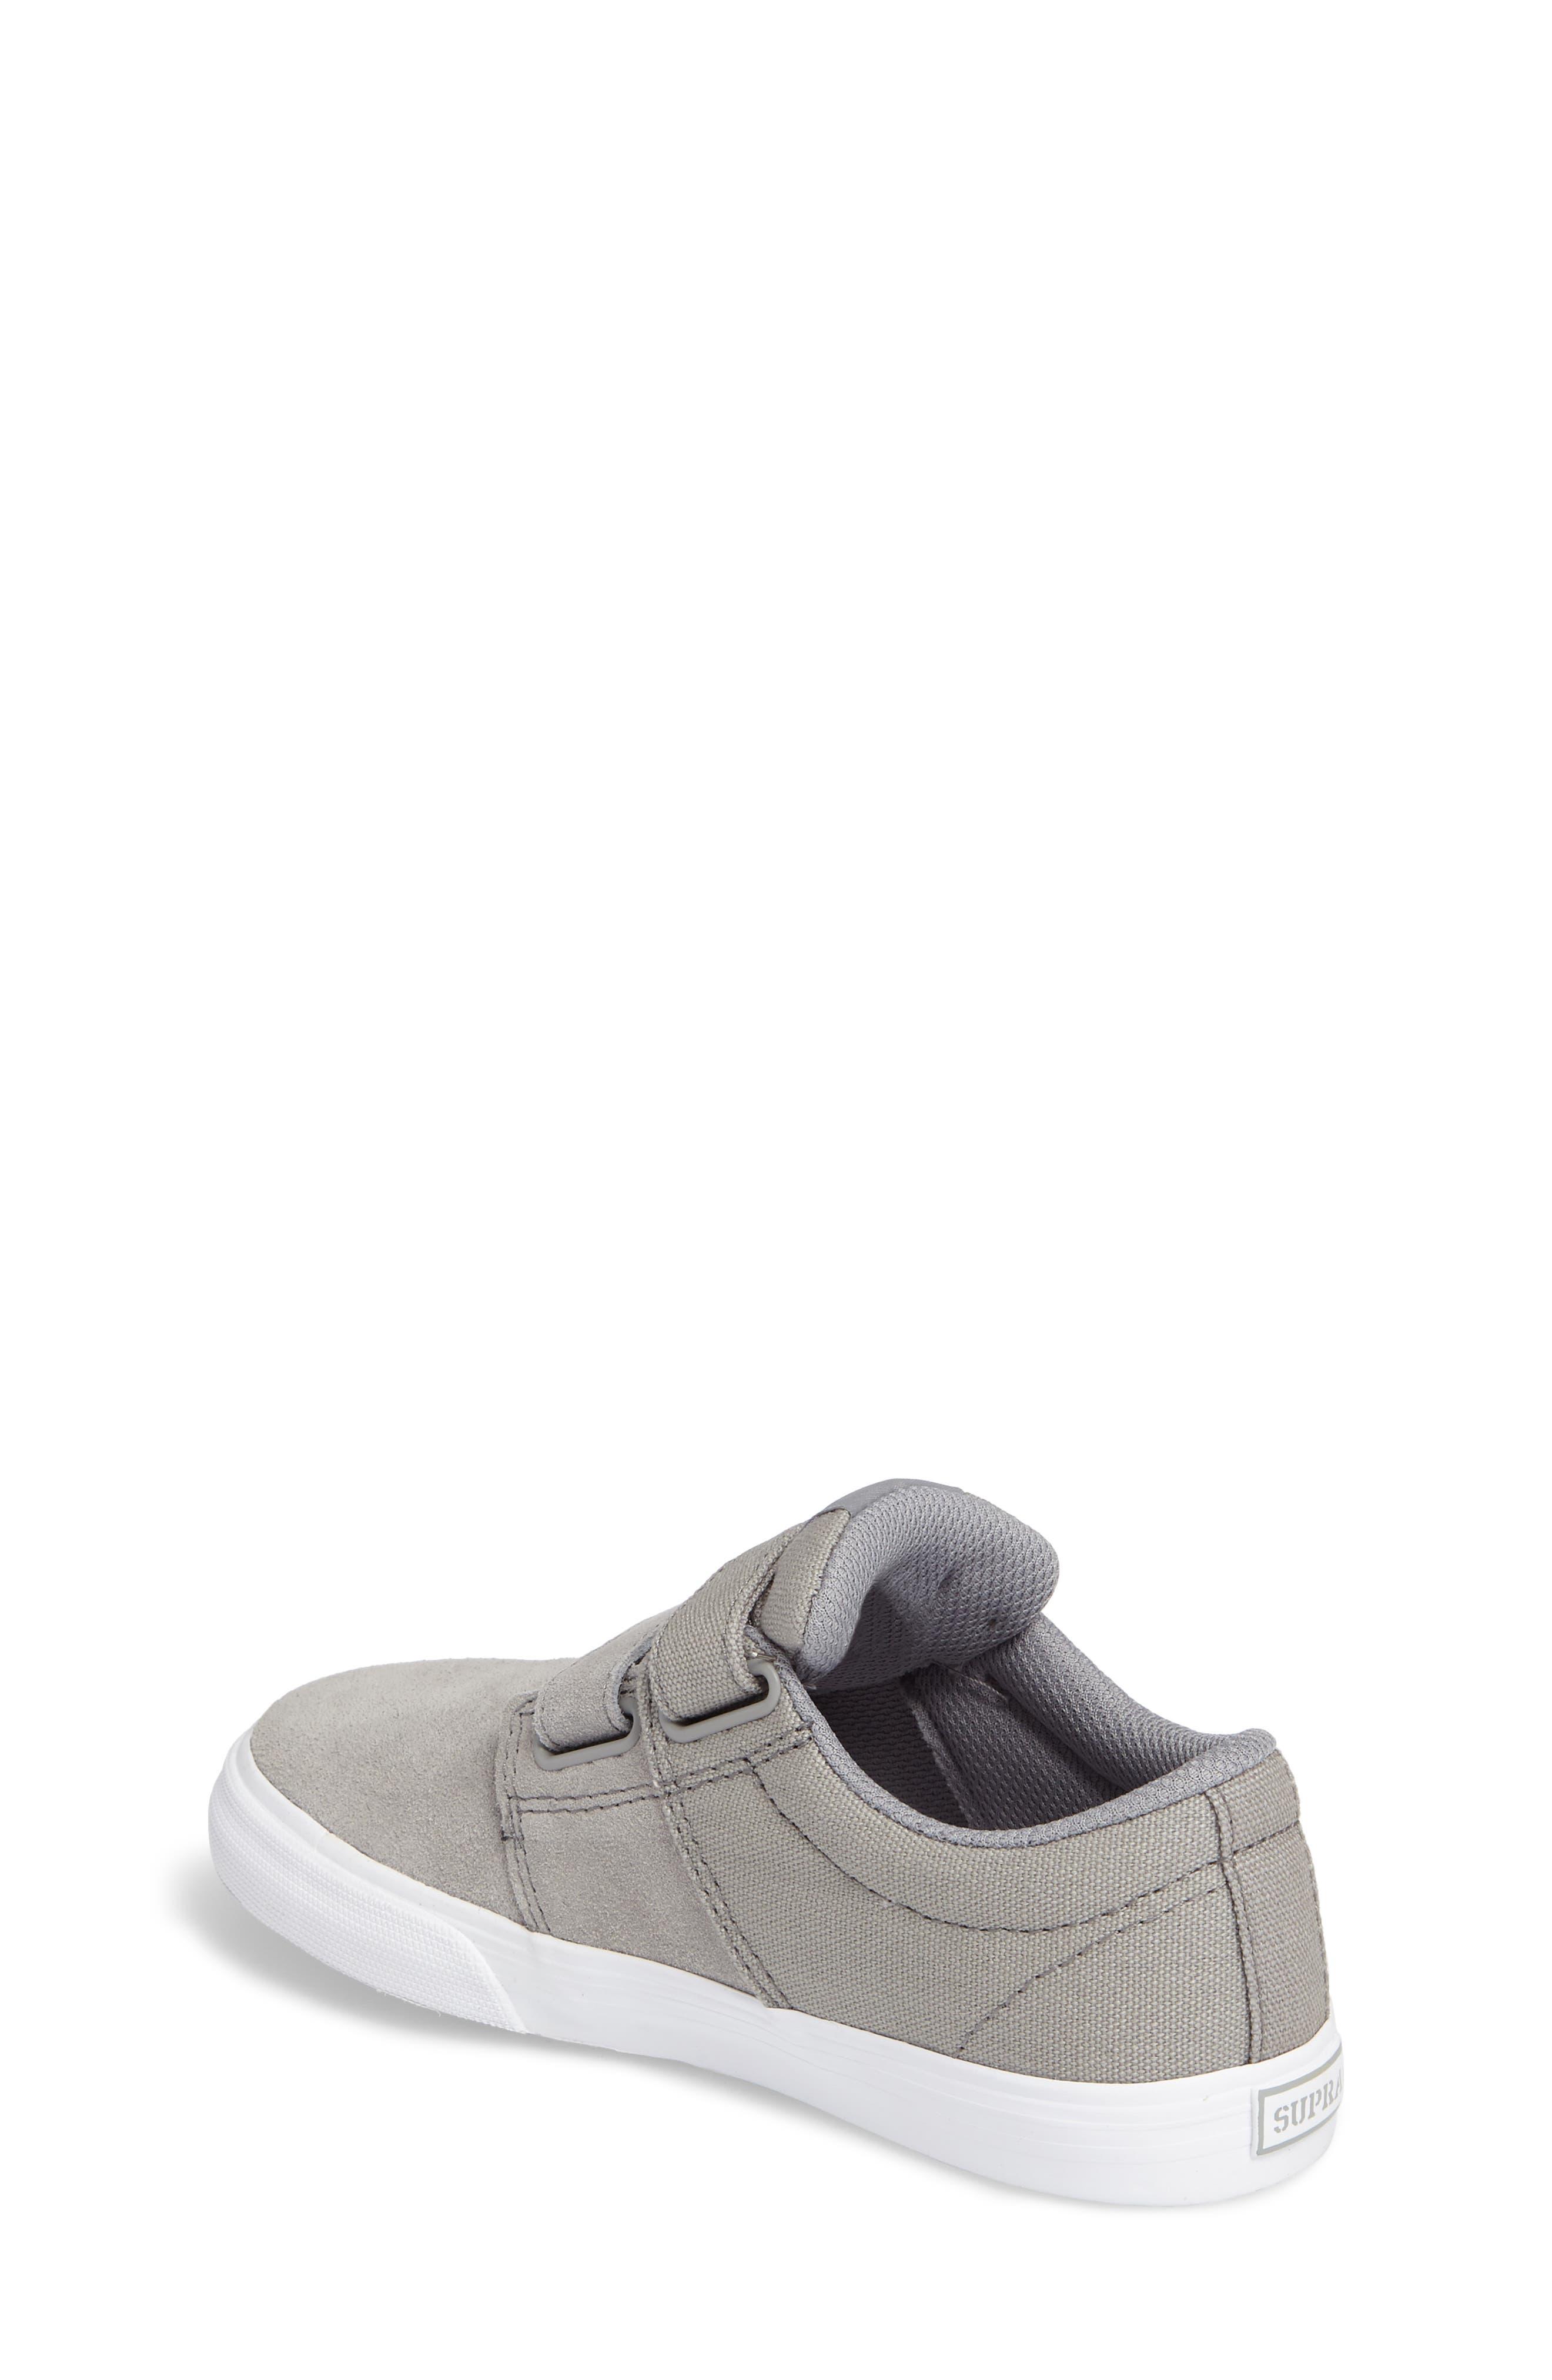 Alternate Image 2  - Supra Stacks Low Top Sneaker (Toddler, Little Kid & Big Kid)